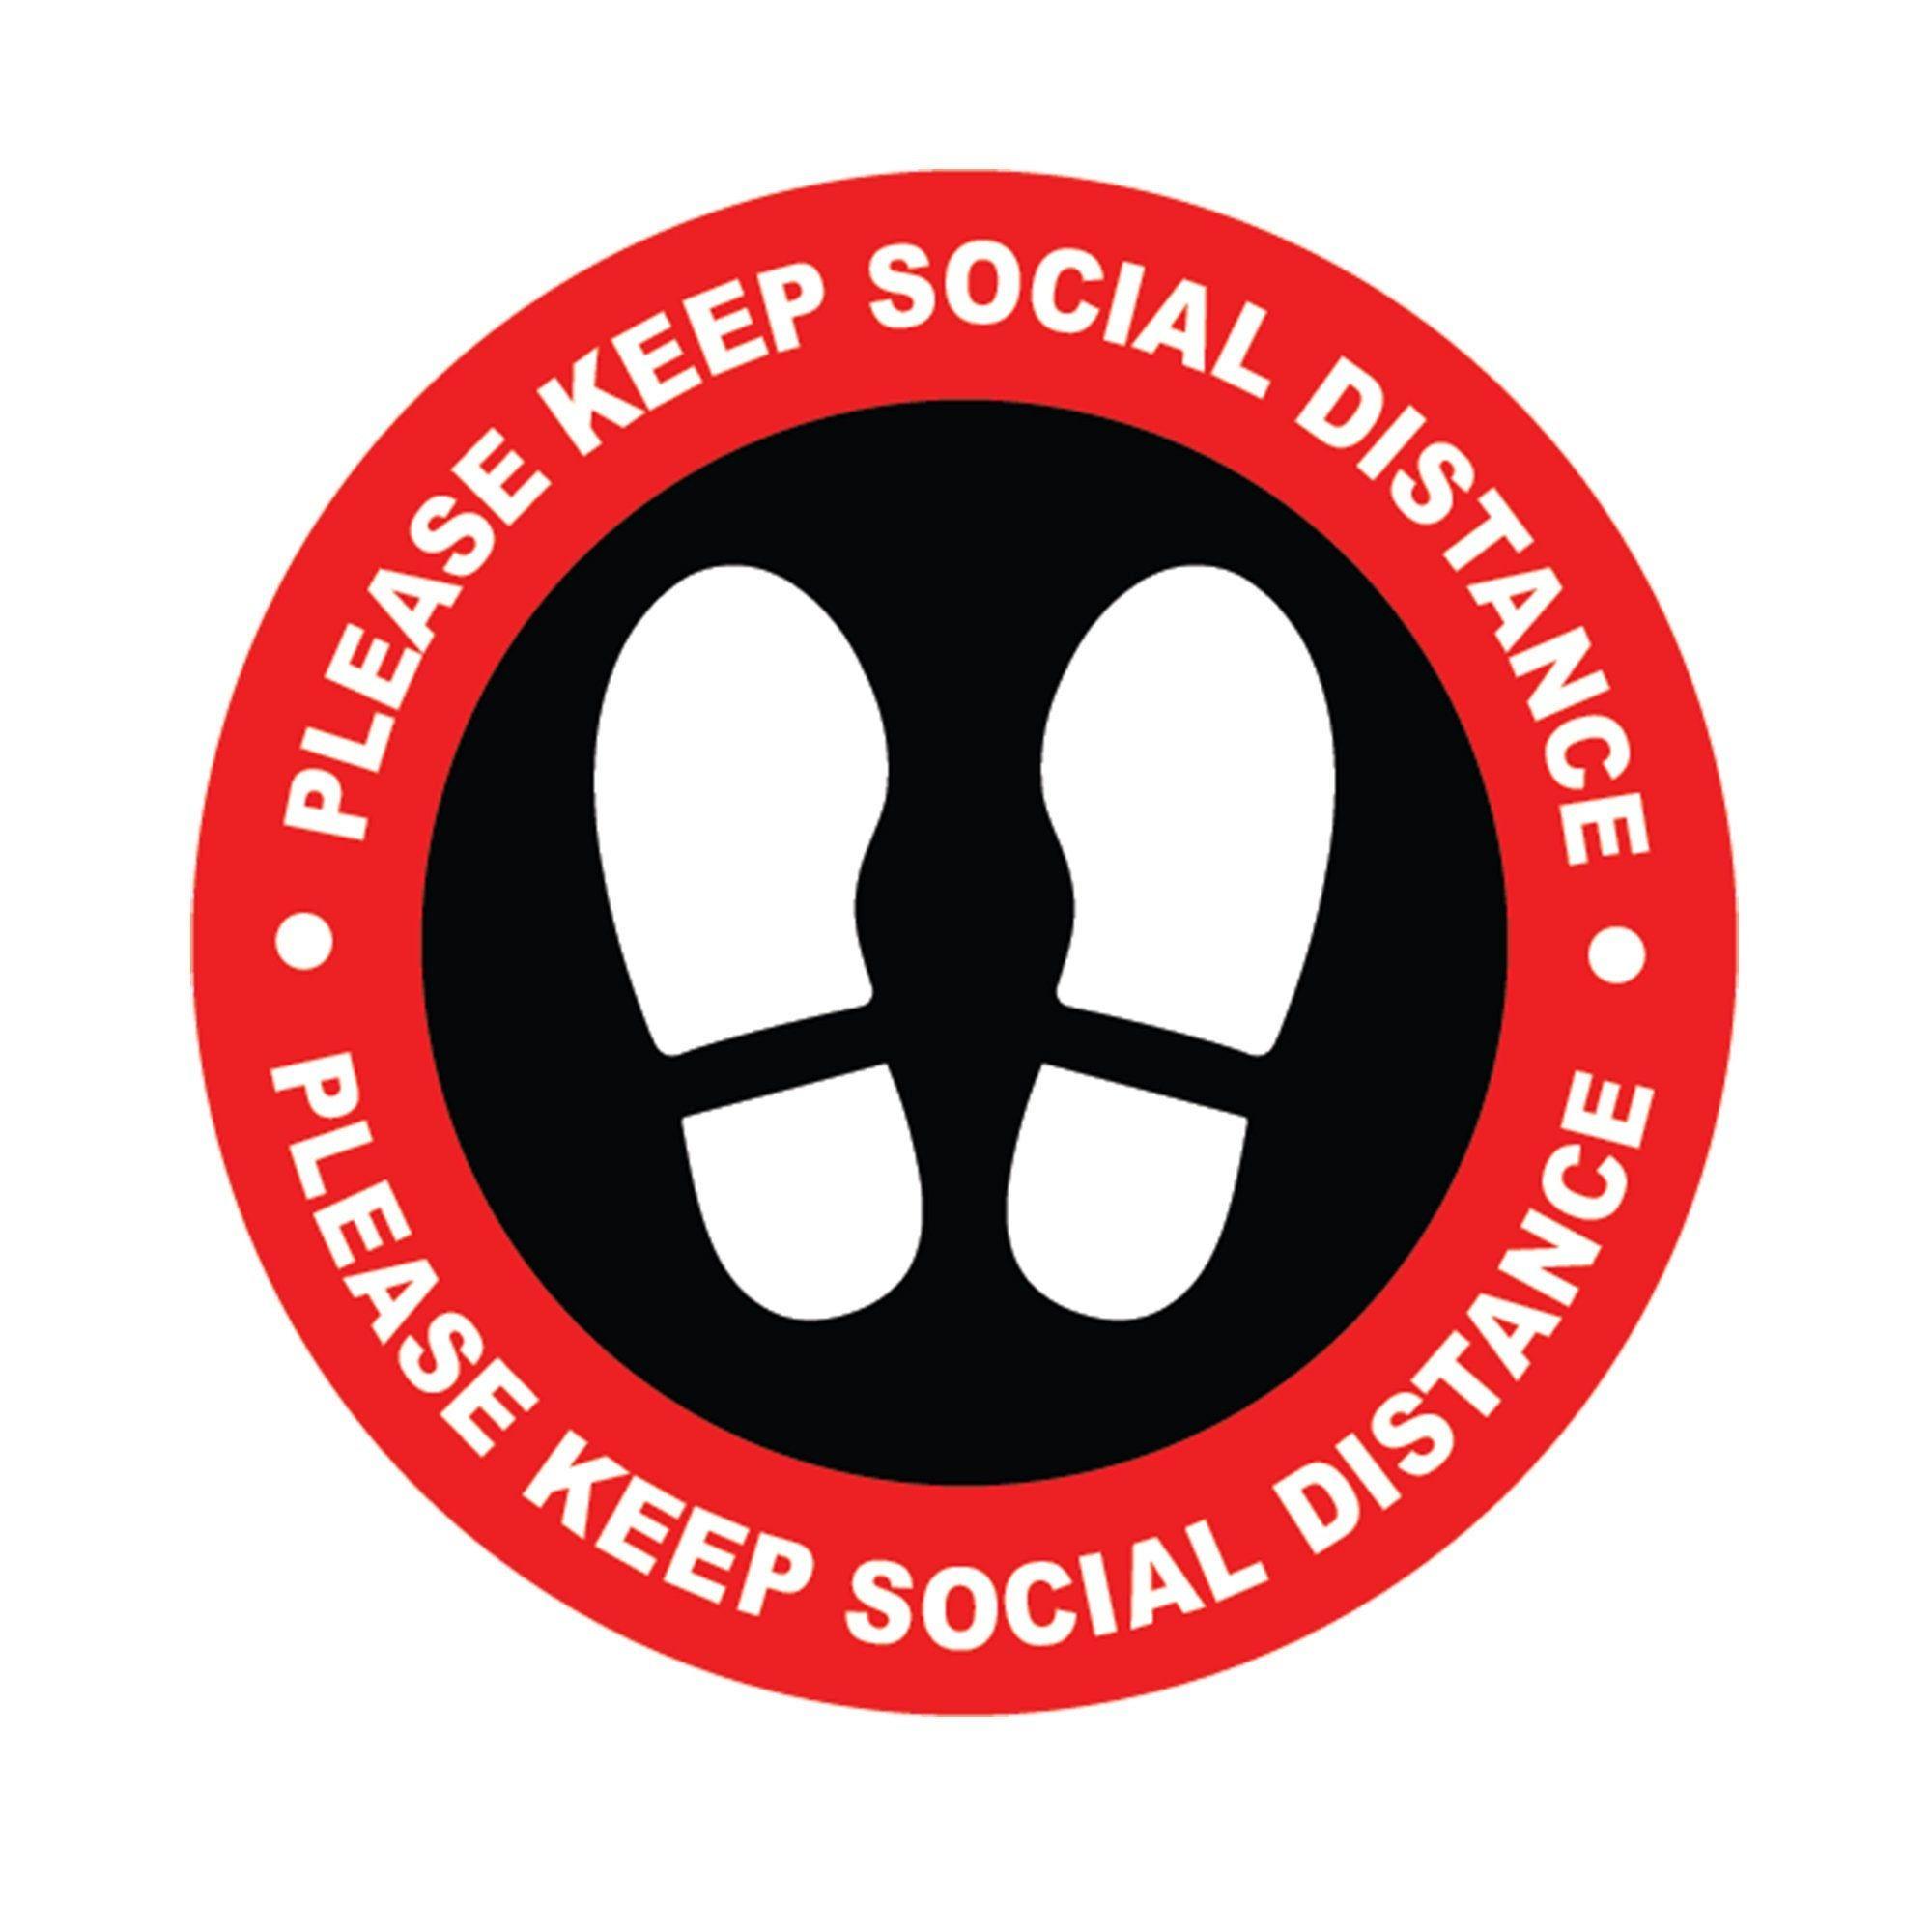 Social Distance Floor Stickers Keep Social Distance Self Etsy Floor Stickers Adhesive Vinyl Glass Floor